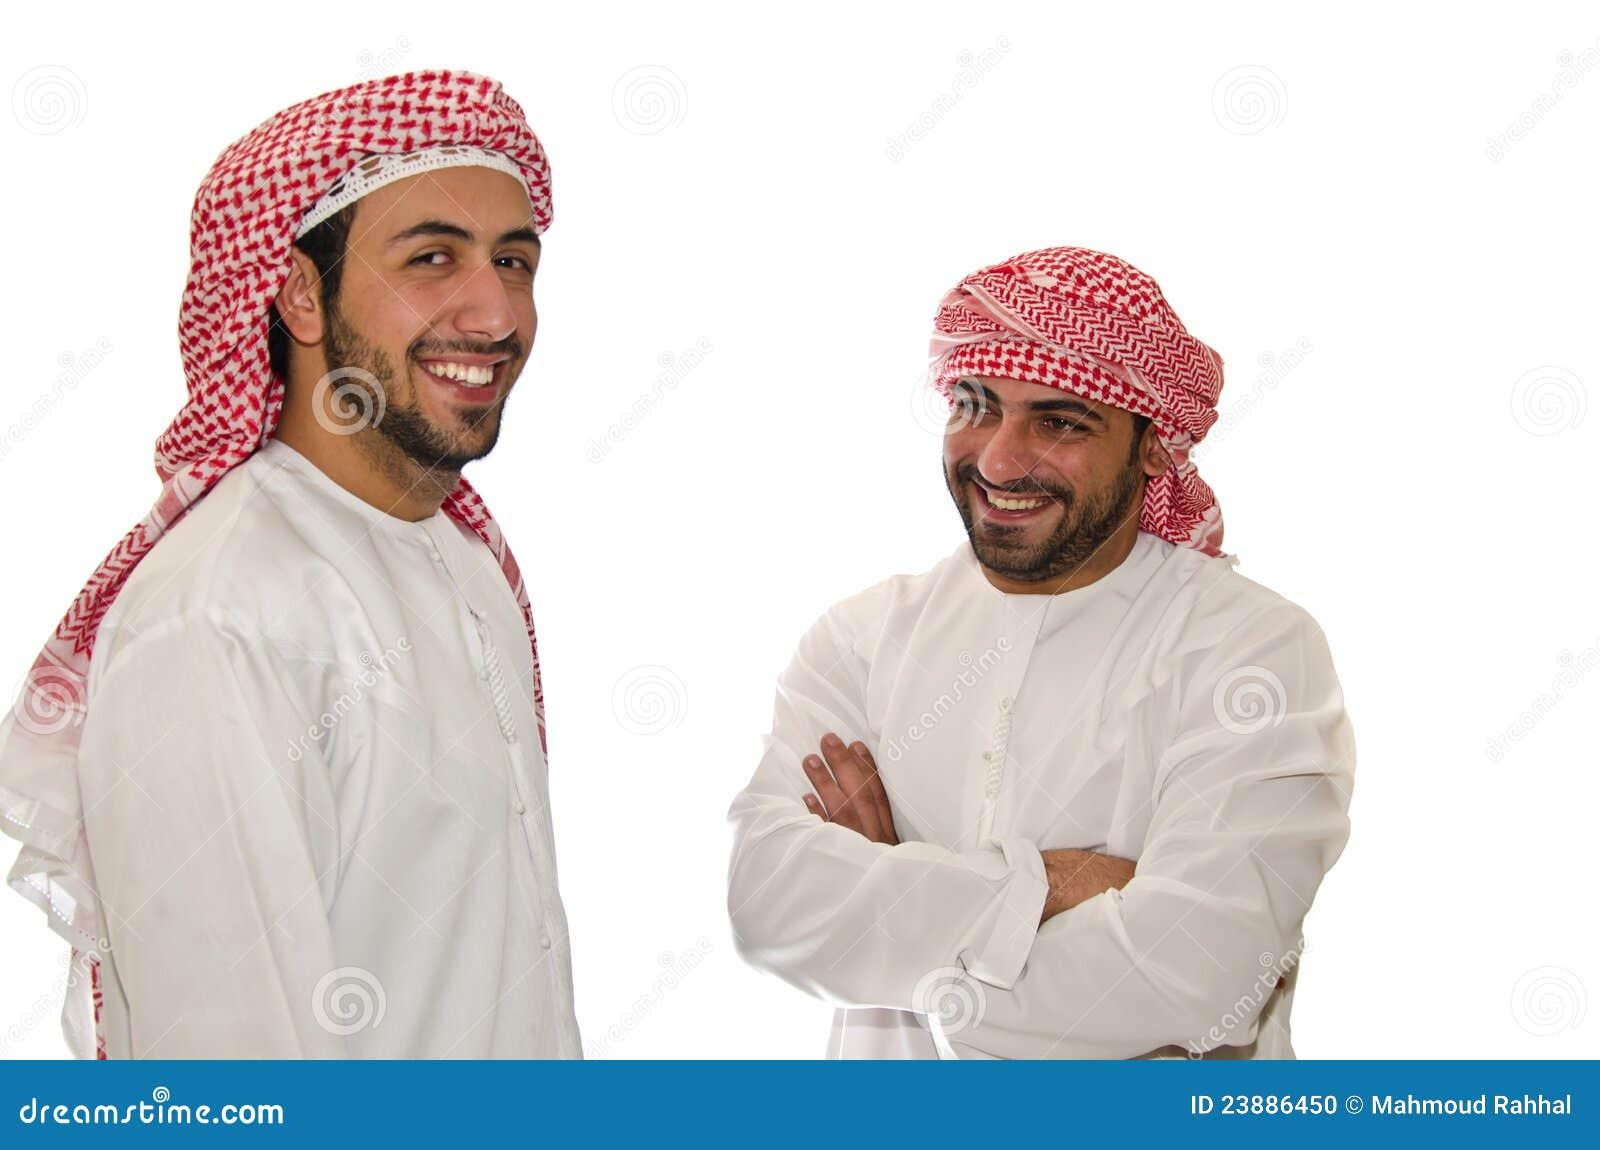 Nude muslim men pix gay flip flop 8